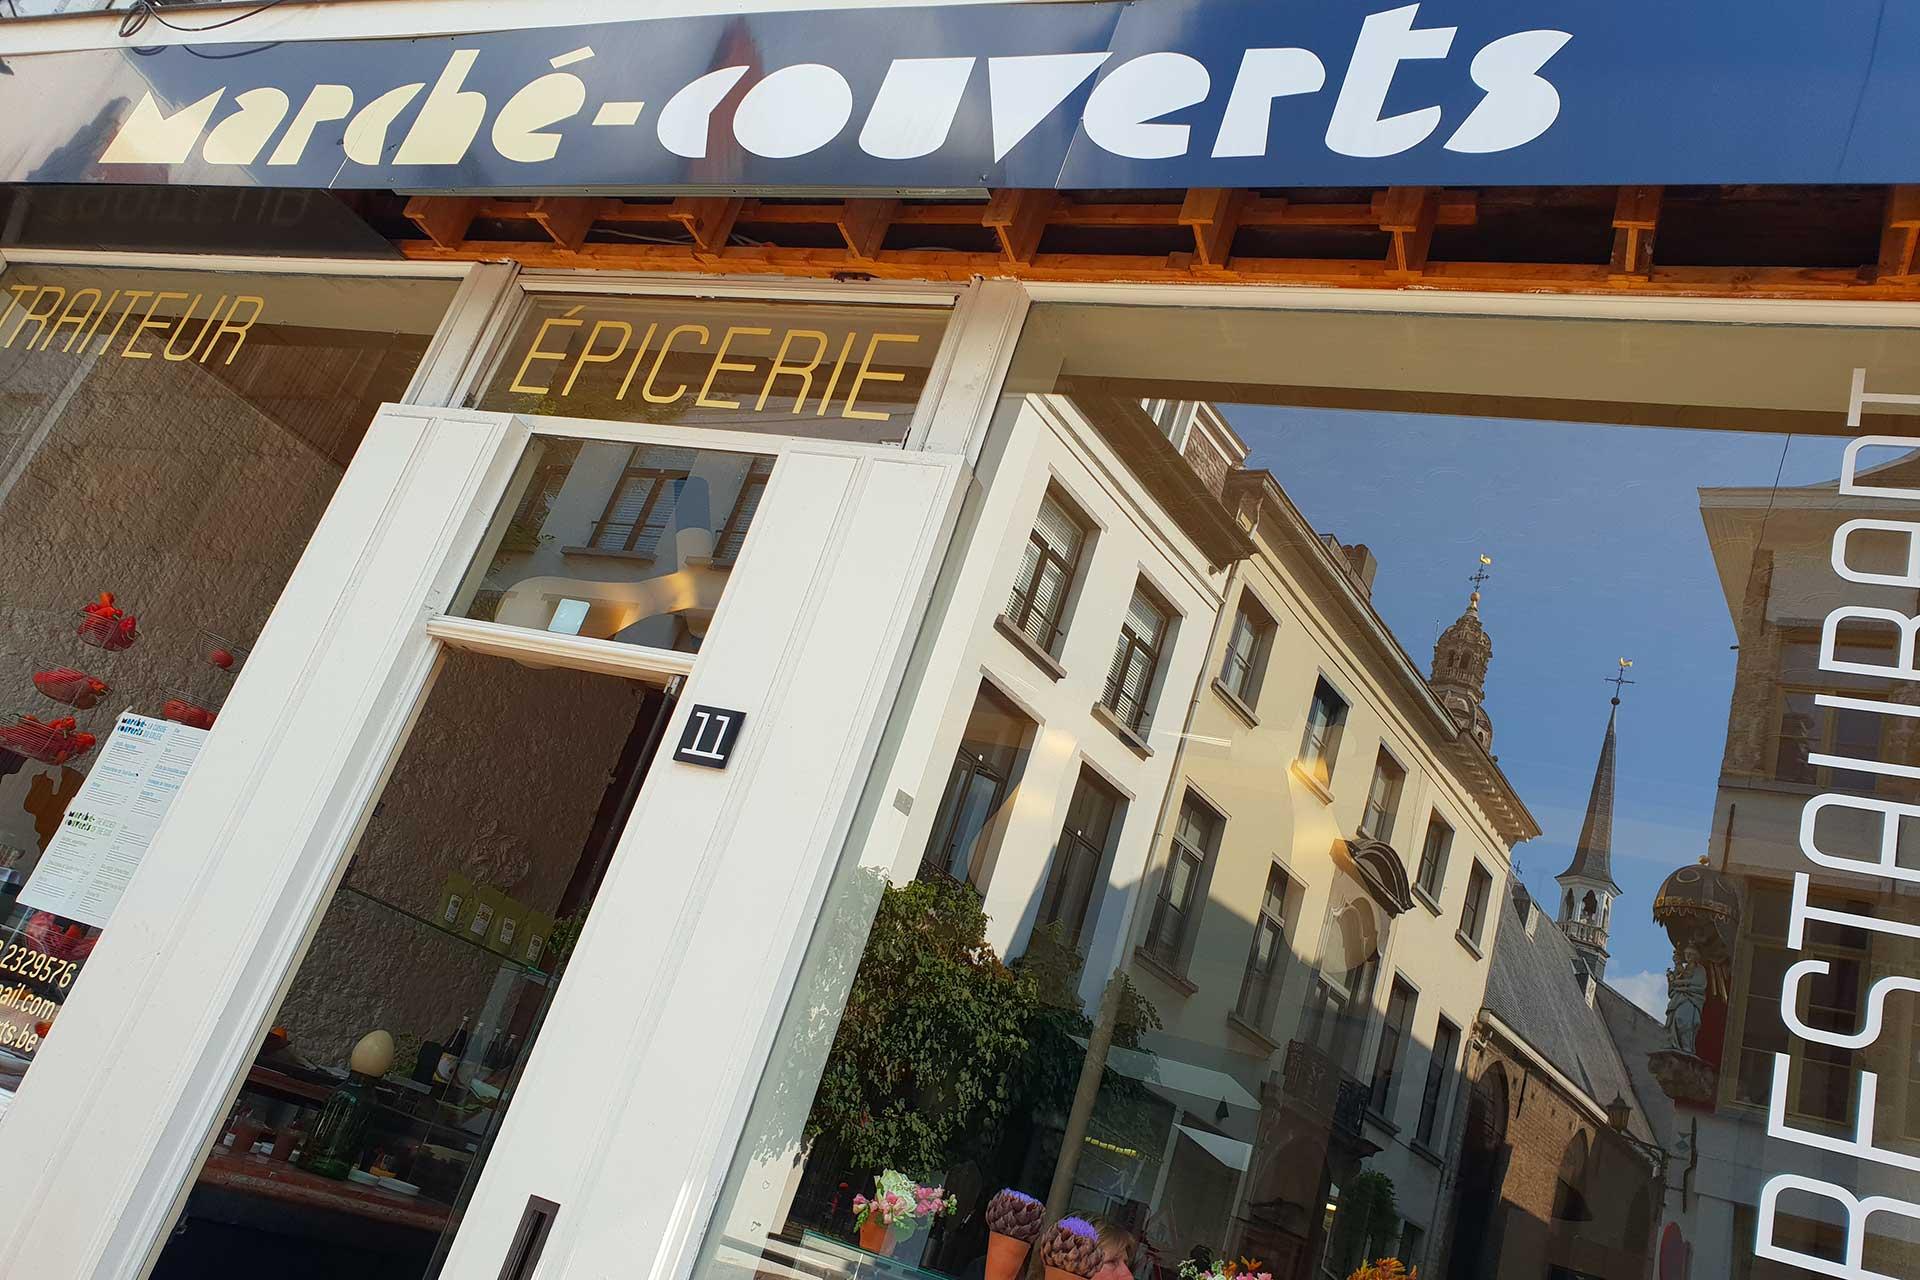 mangiare ad Anversa